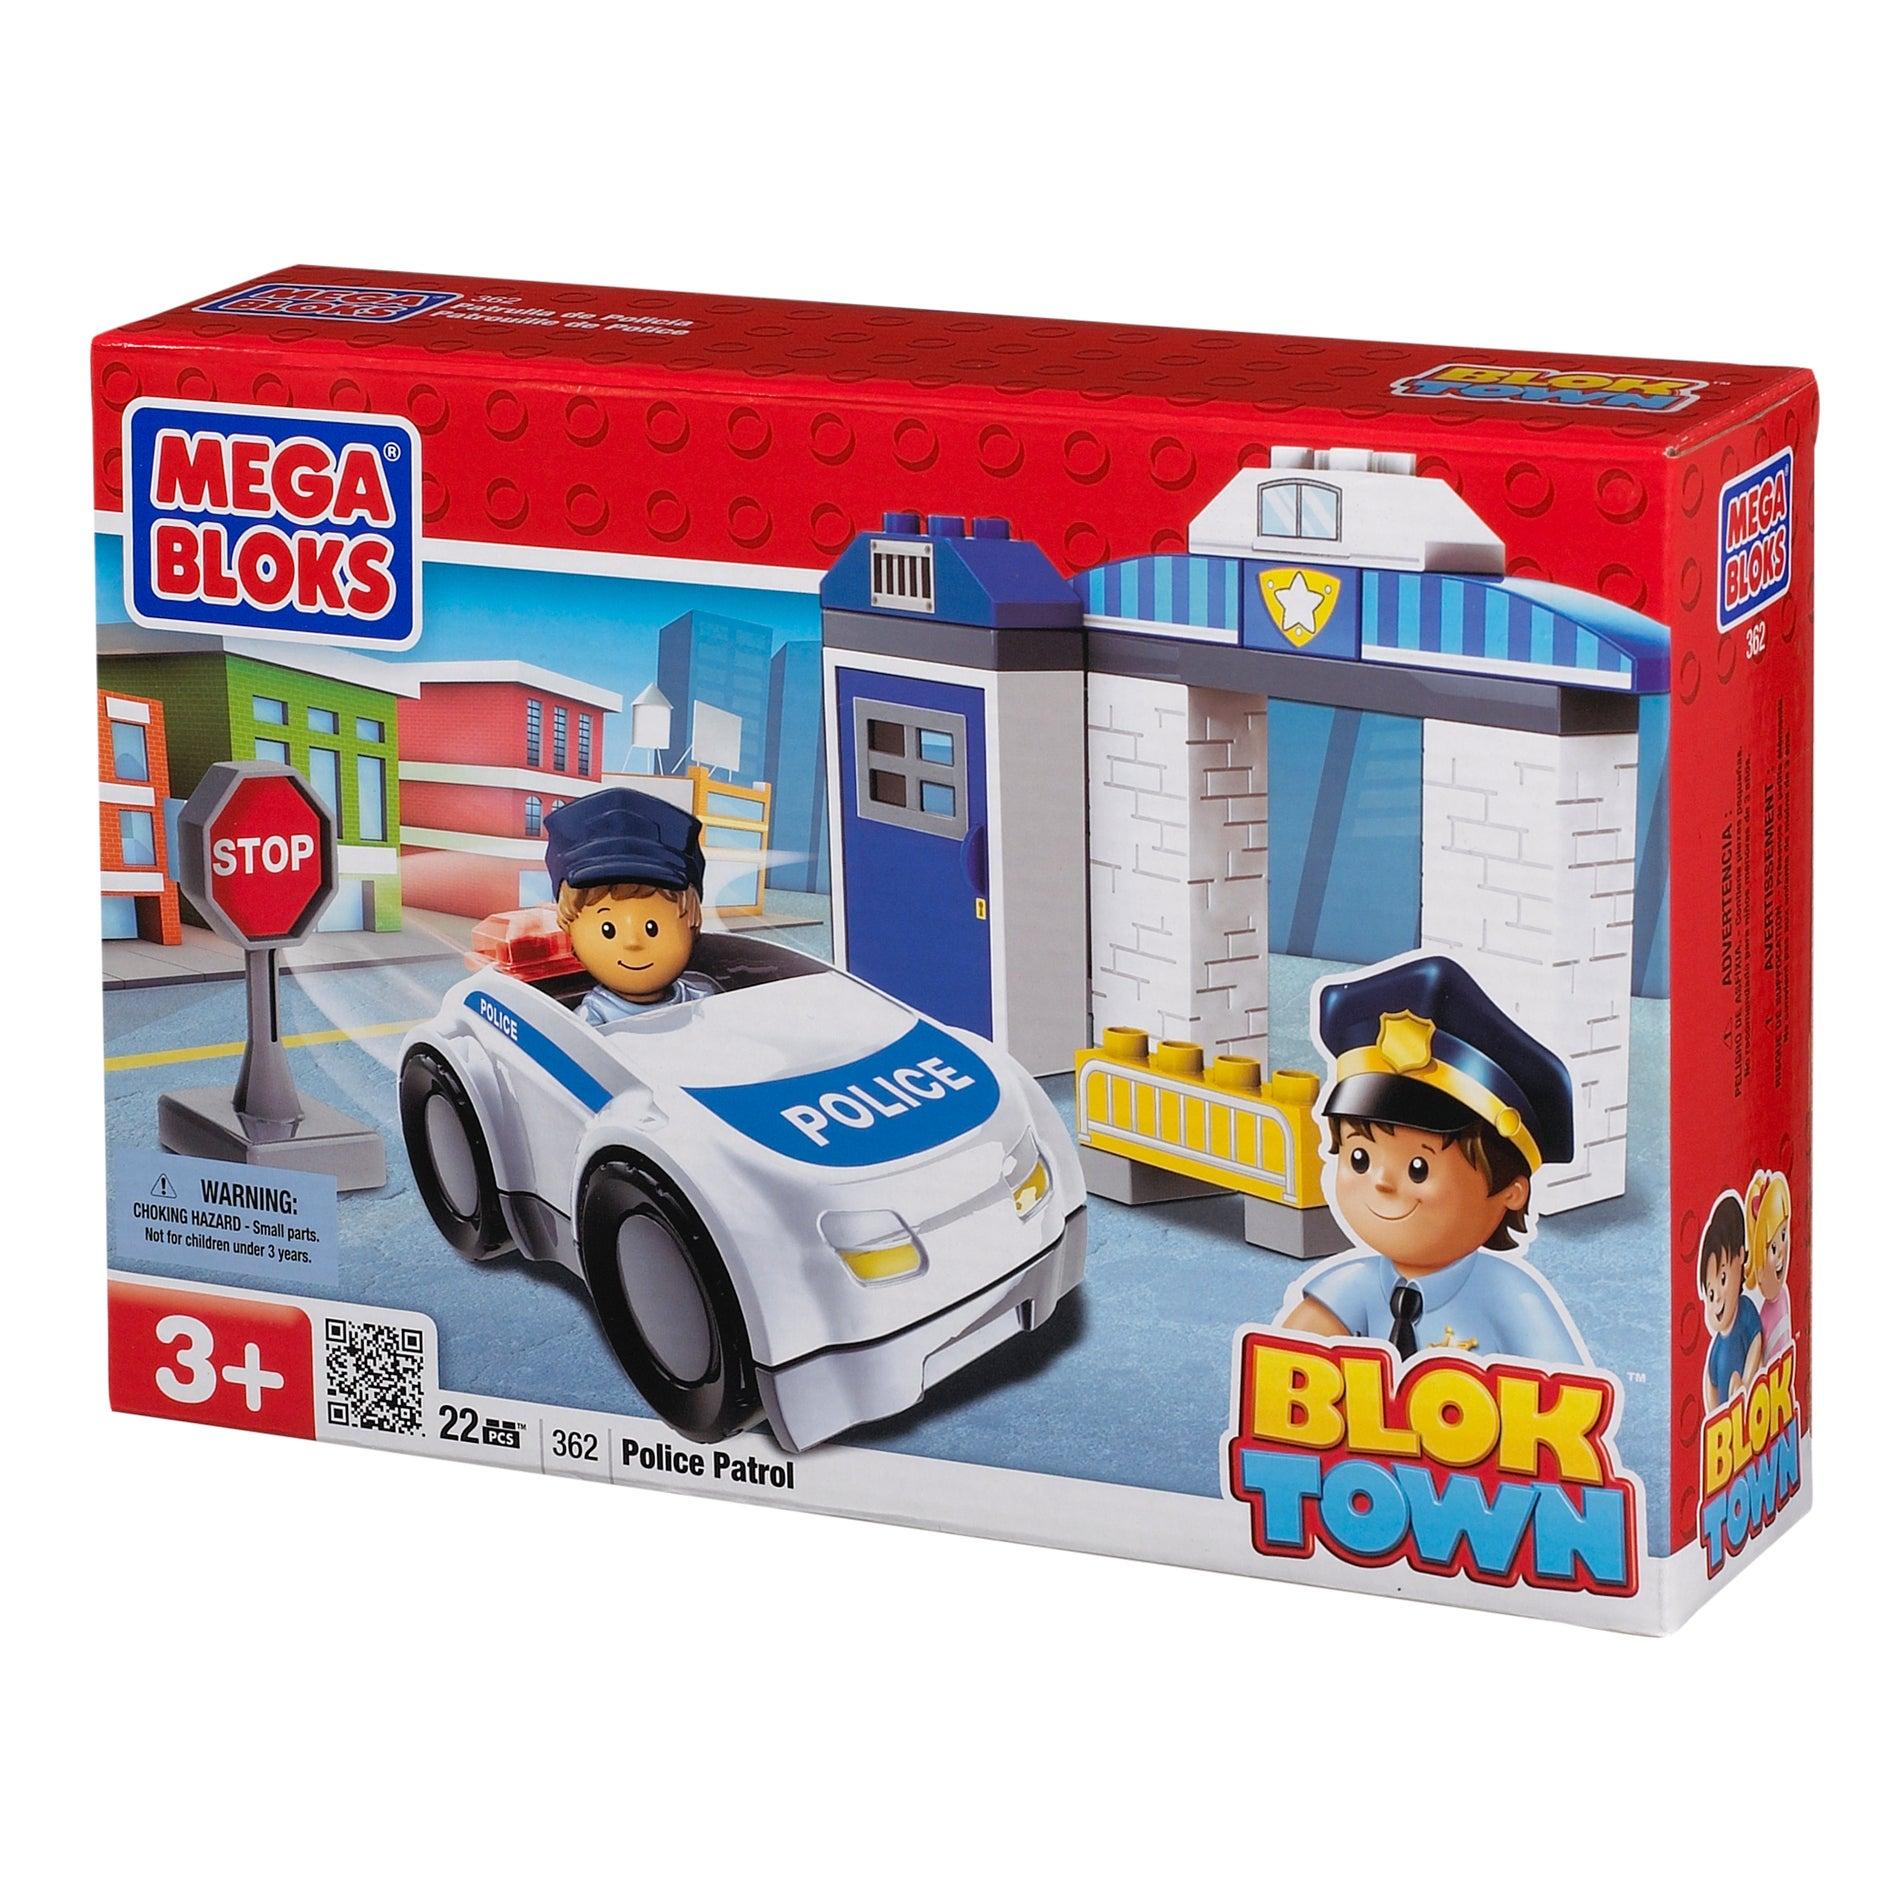 Mega Bloks BlokTown Police Patrol Play Set